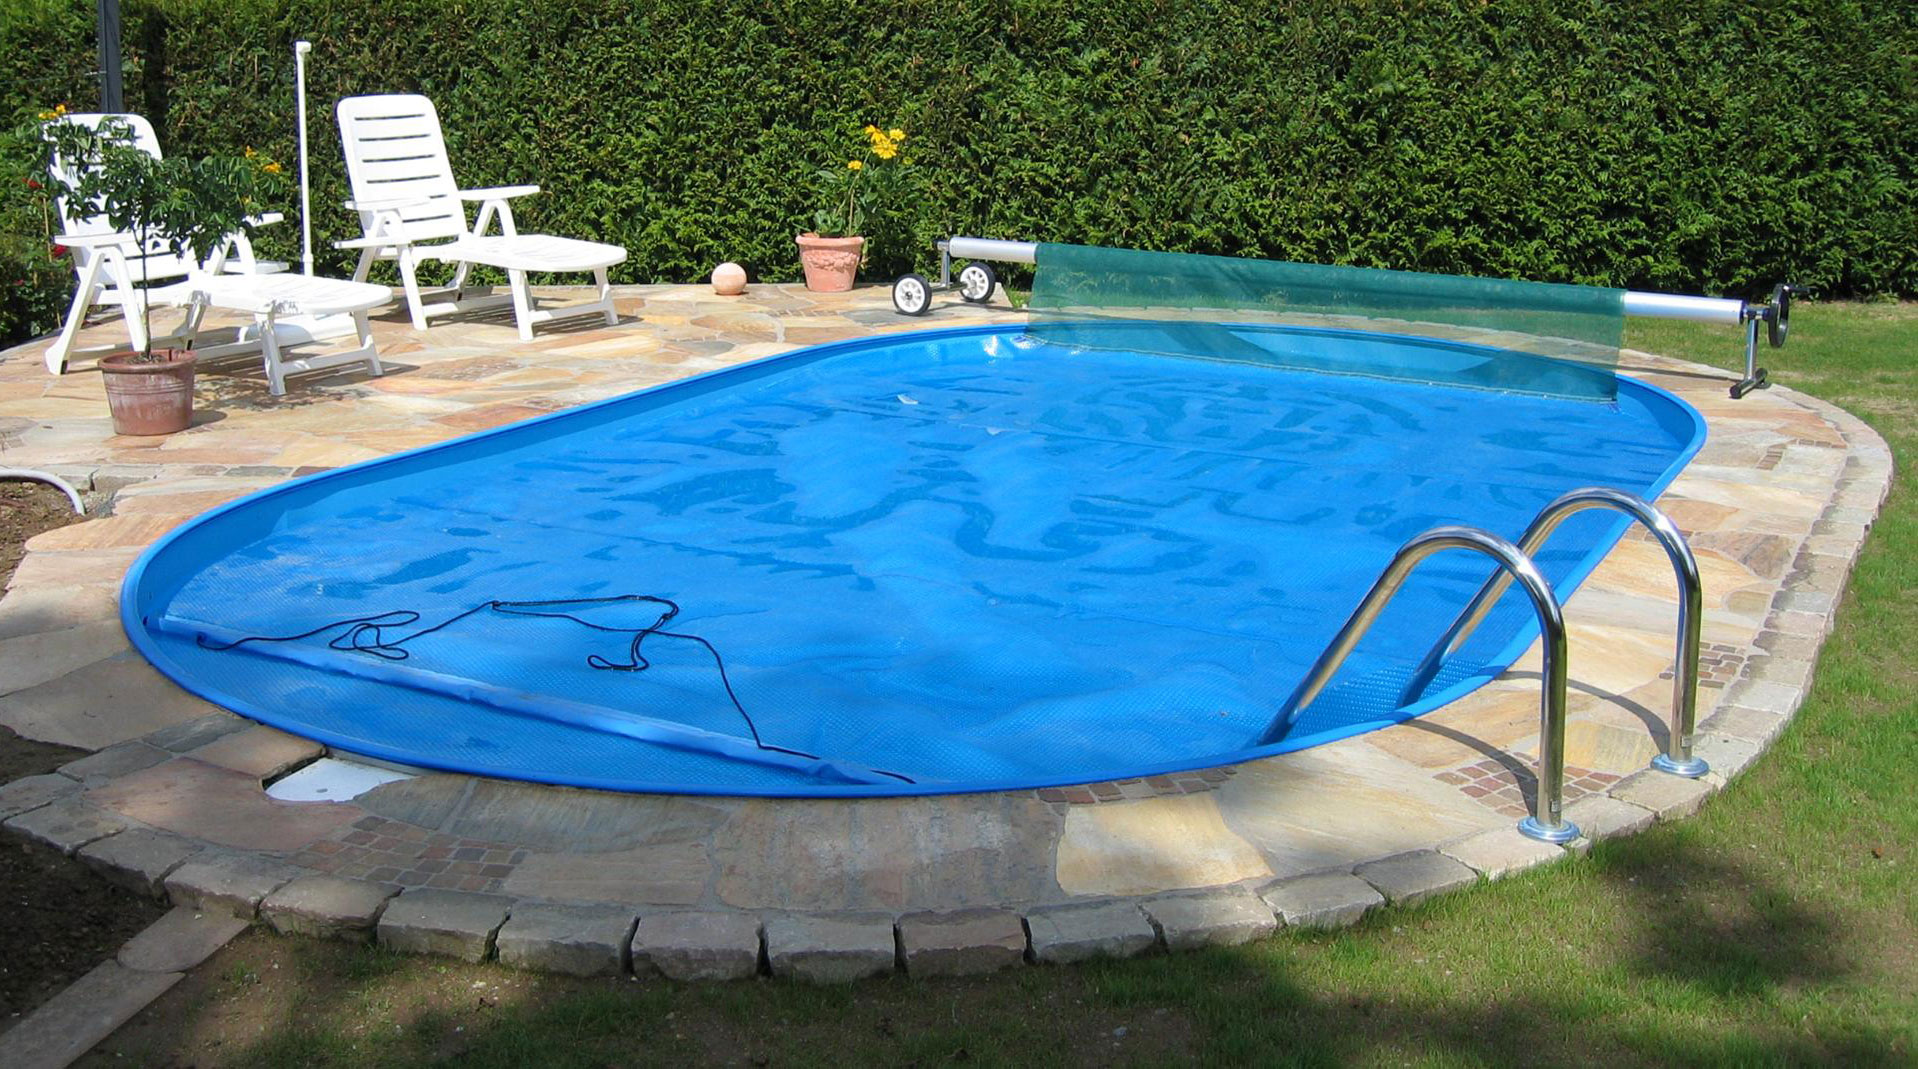 pool schwimmbecken trend oval mit sandfilter 4 50x2 50x1. Black Bedroom Furniture Sets. Home Design Ideas